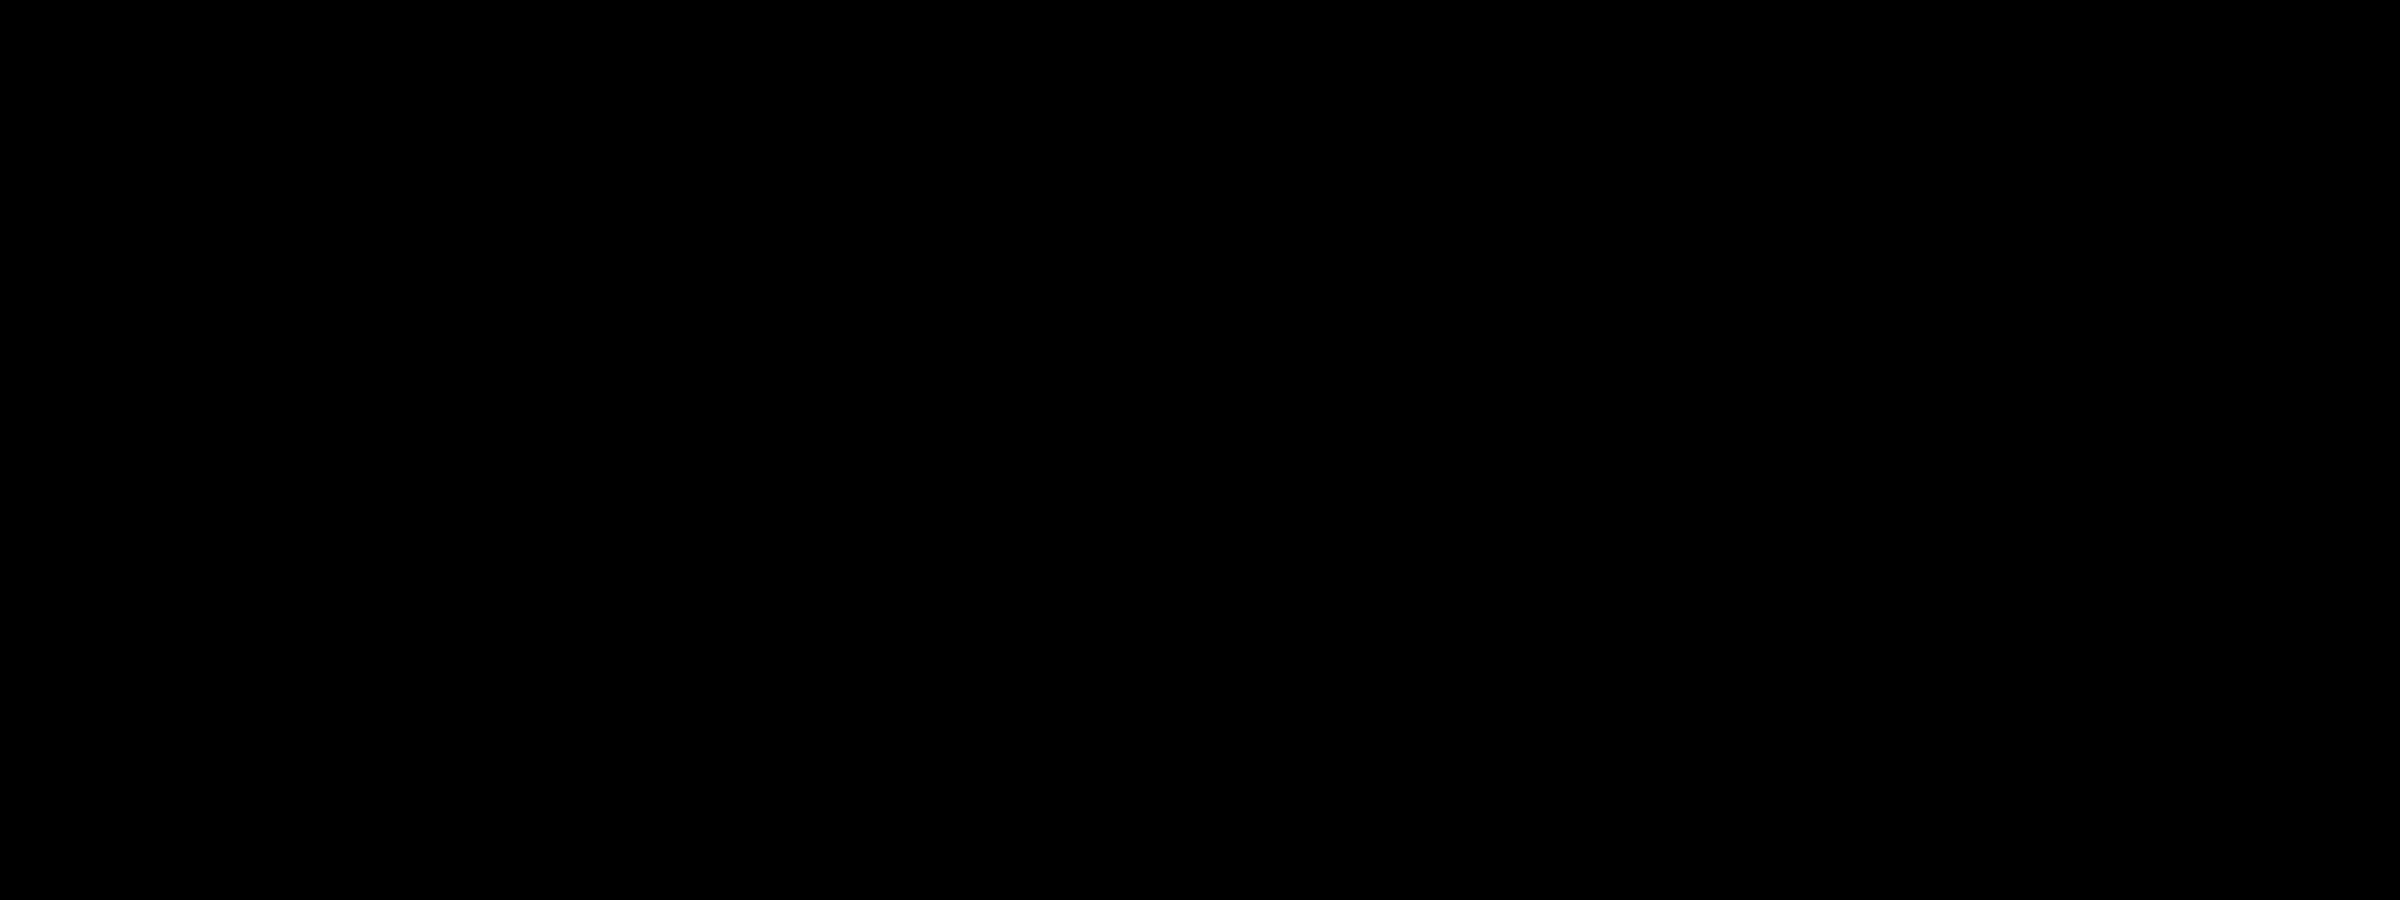 logo_black_2400px